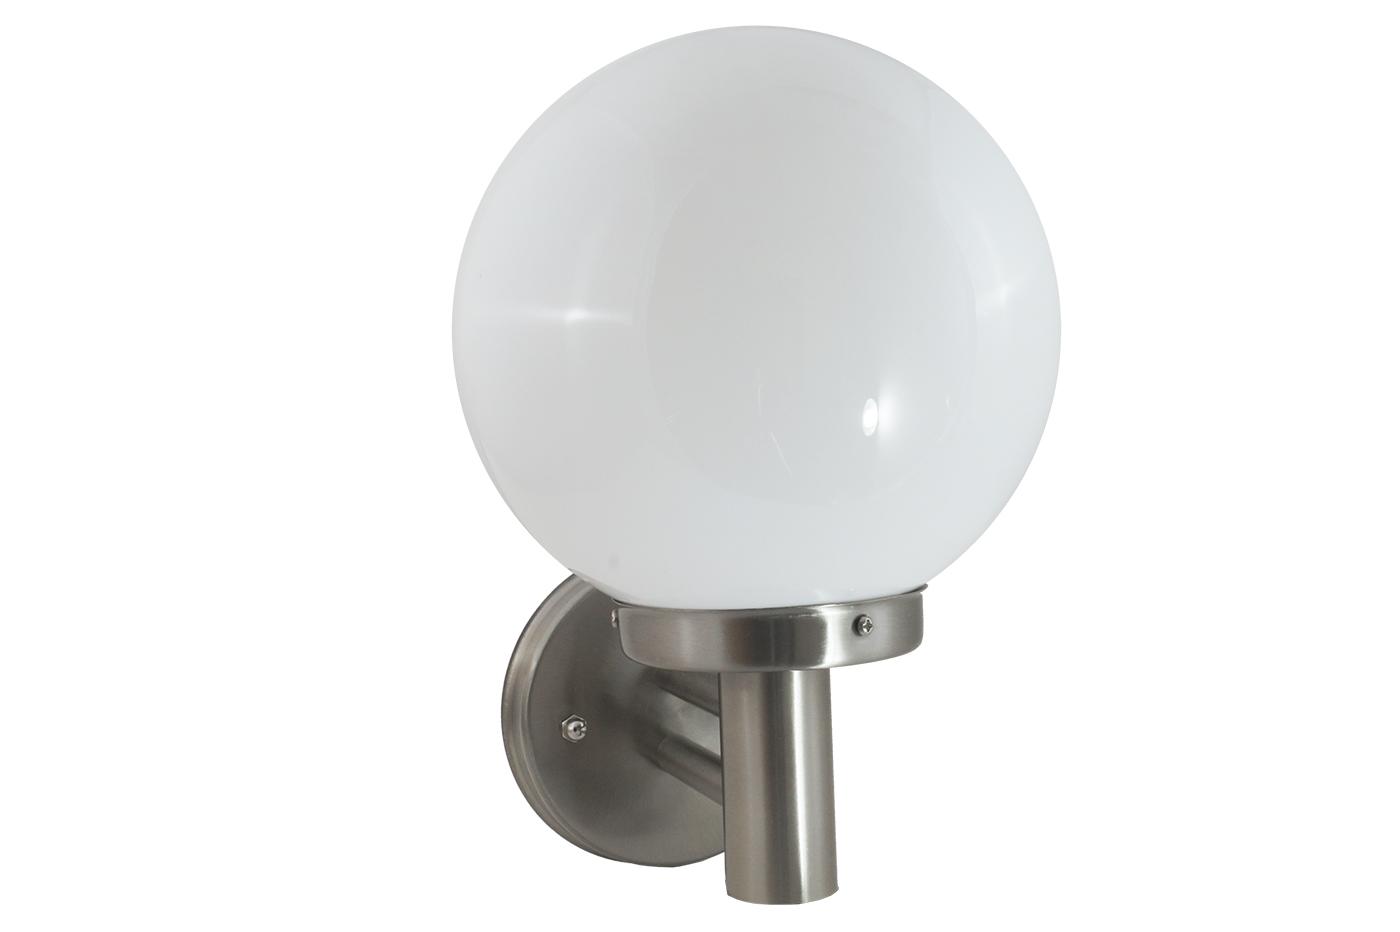 Bes applique beselettronica lampione lampioncino